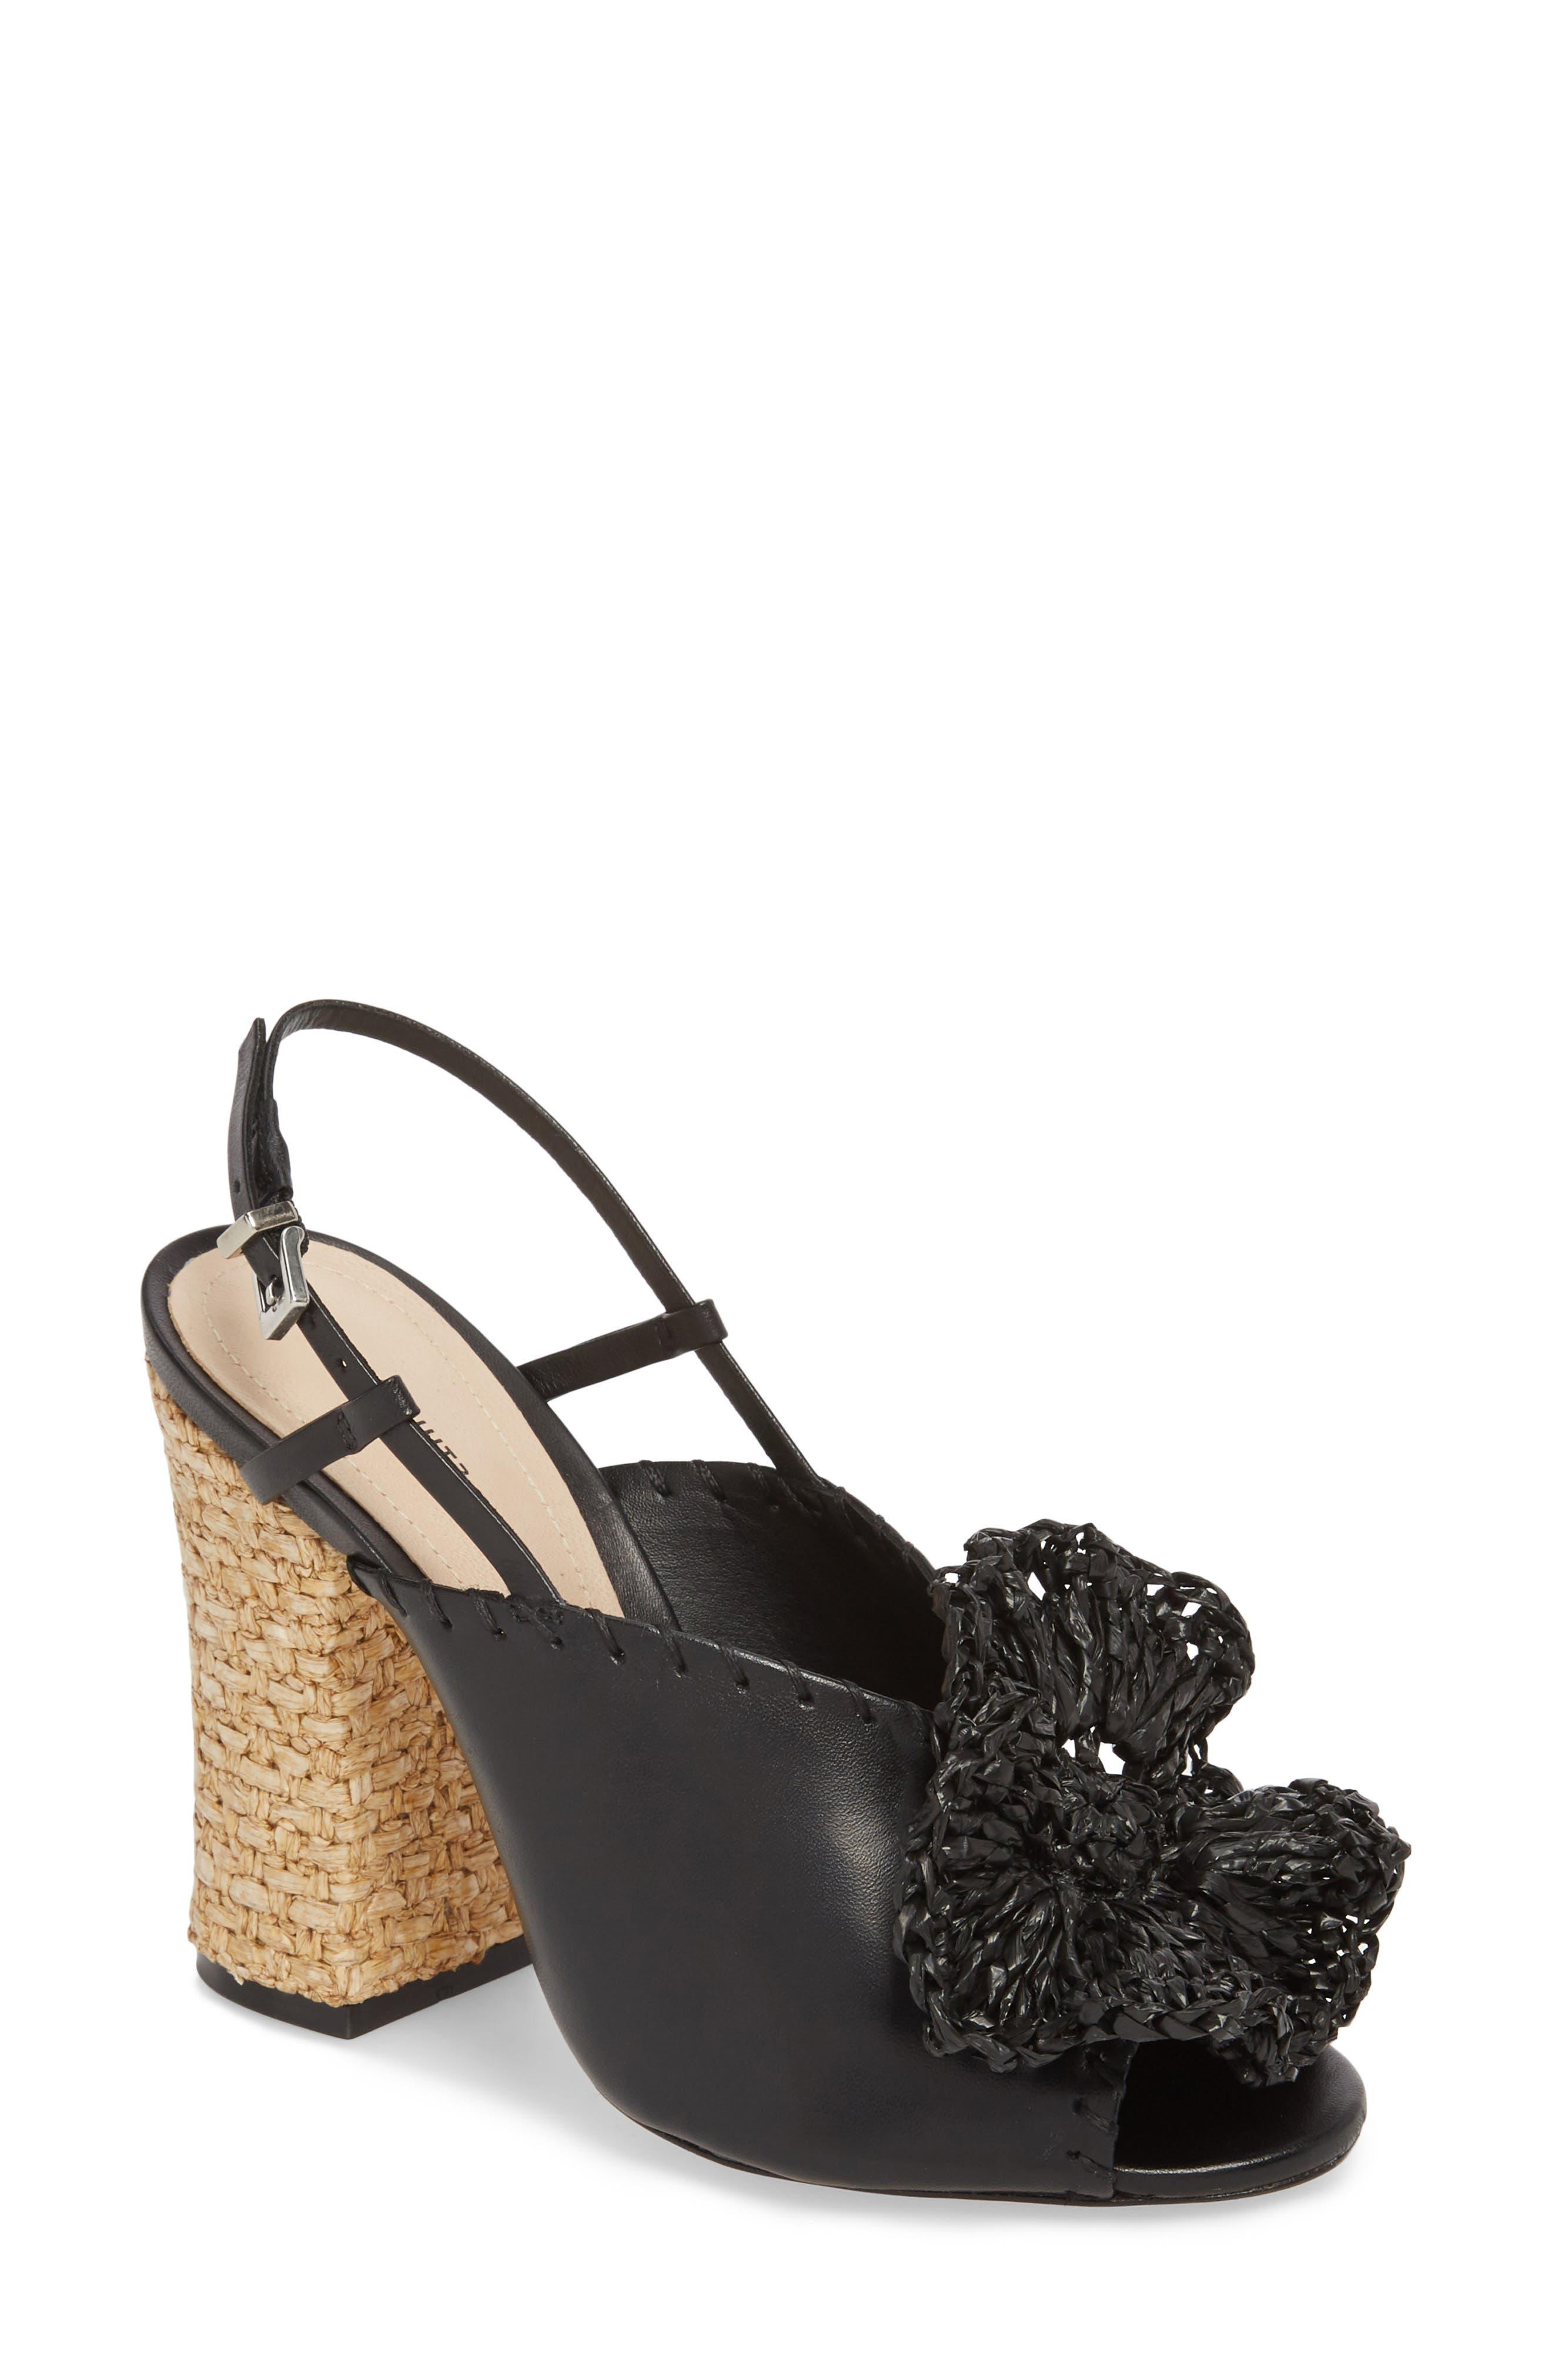 SCHUTZ Milani Sandal, Main, color, BLACK